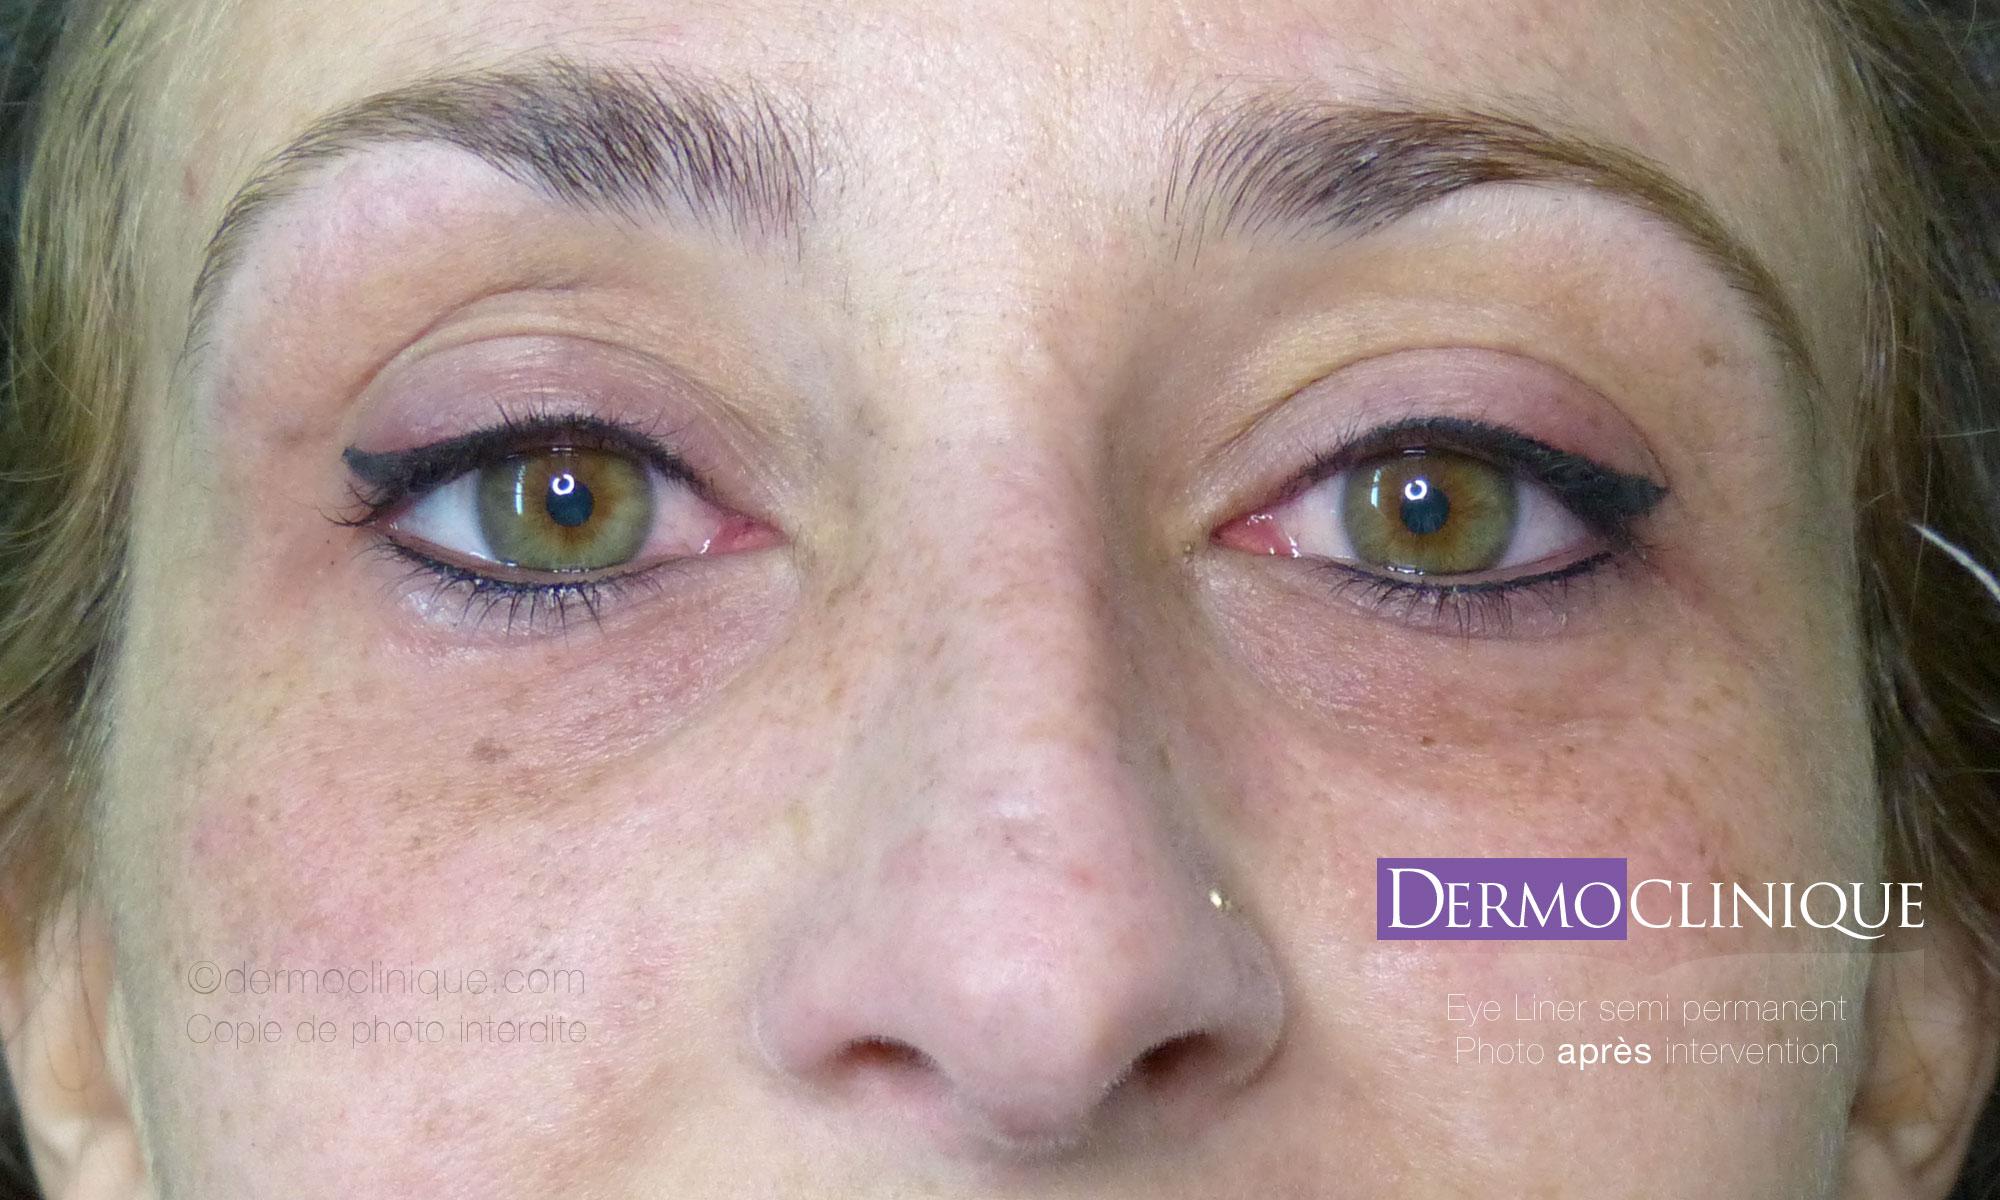 Eye liner permanent